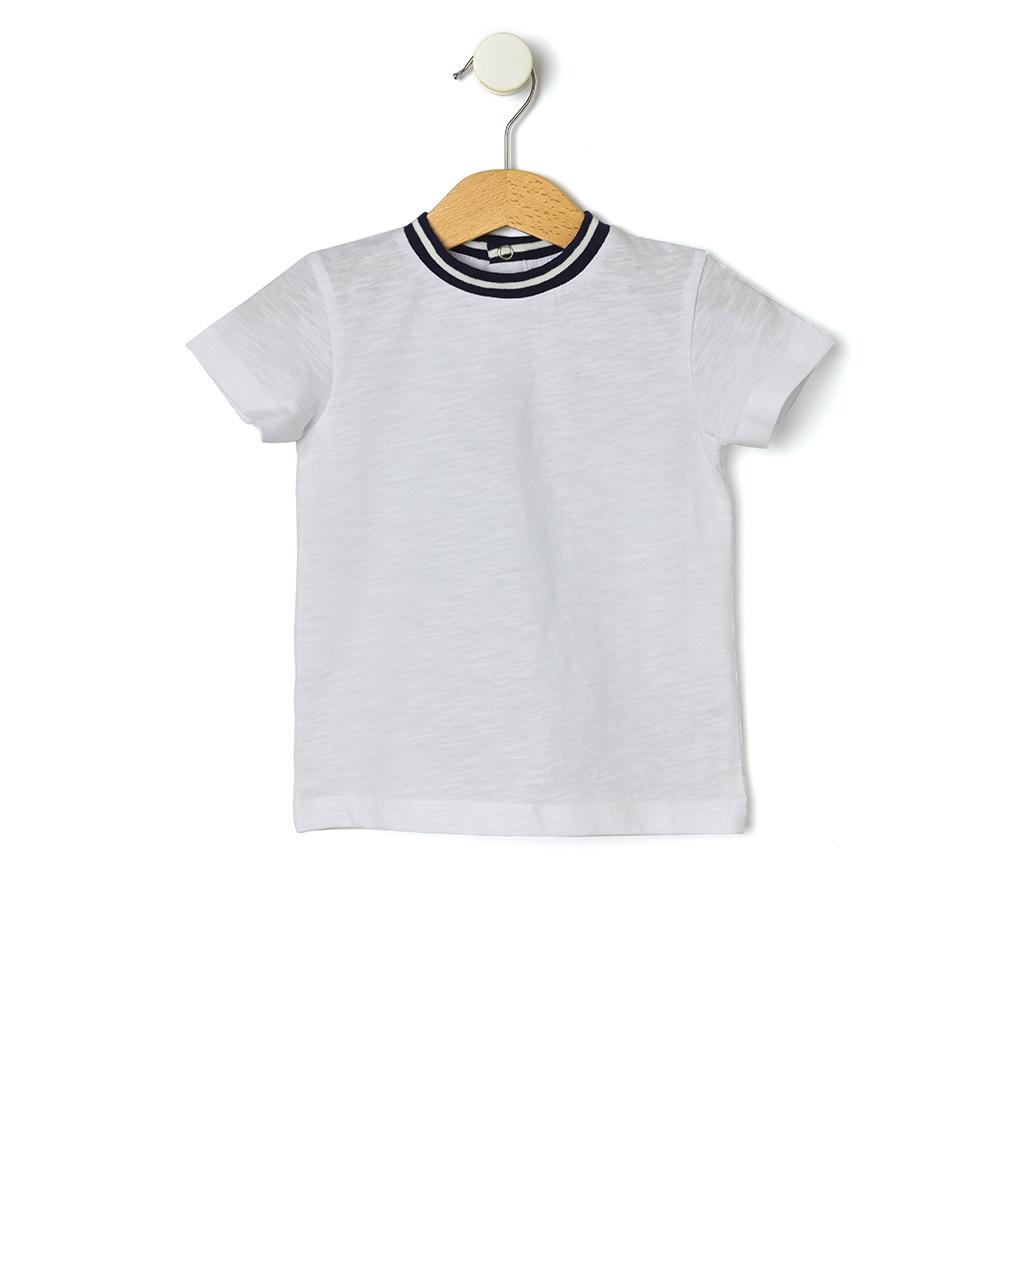 T-shirt Βαμβακερό Λευκό για Αγόρι